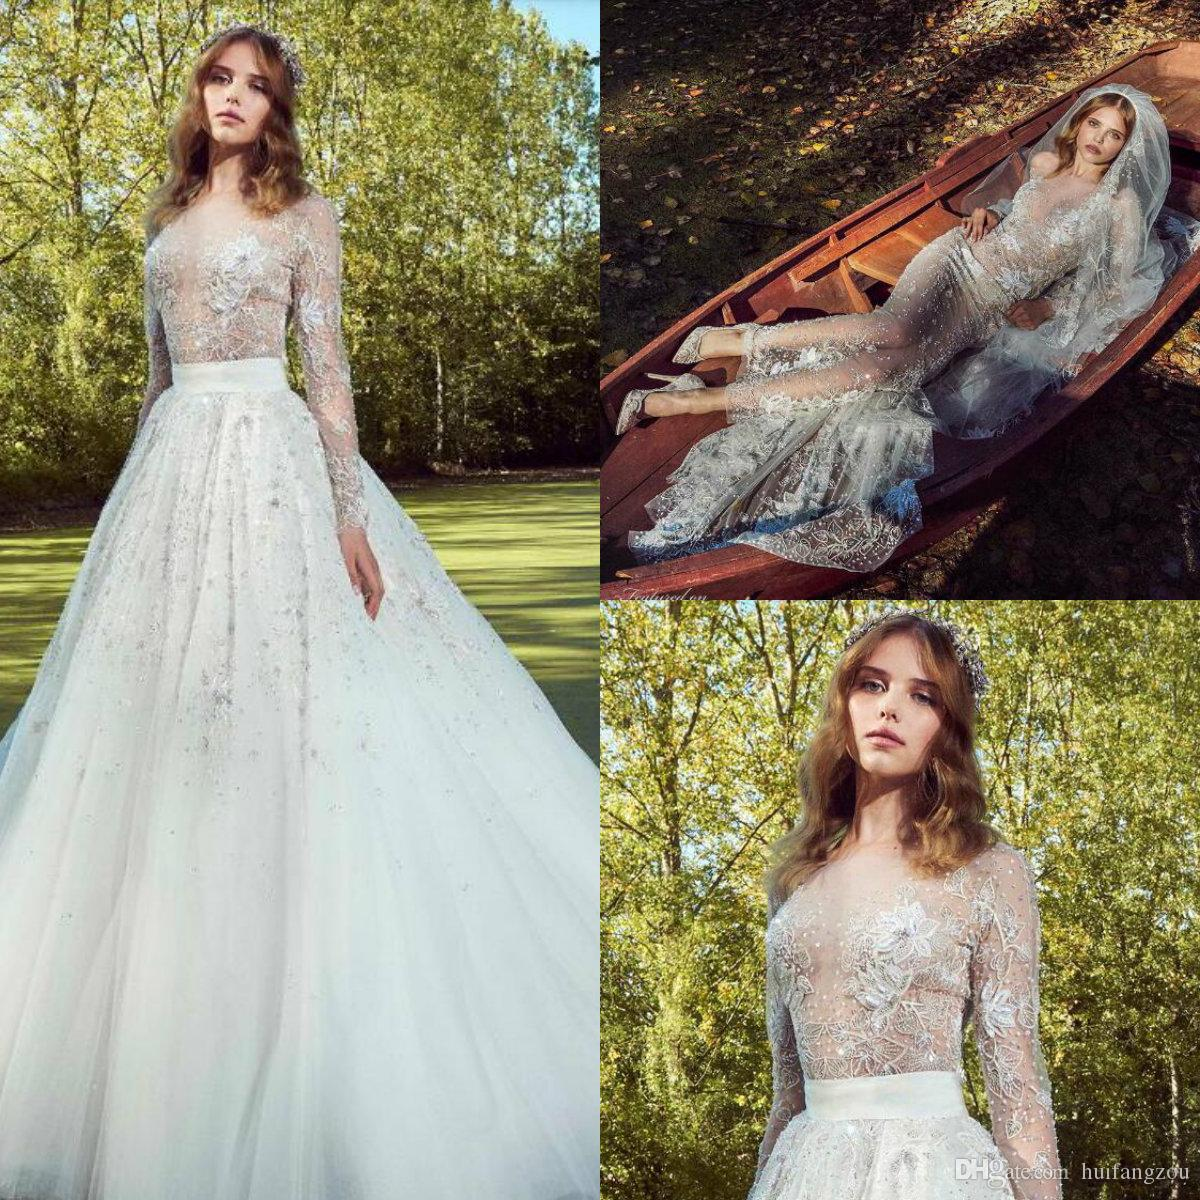 a56510df773 Discount Zuhair Murad 2019 Wedding Dresses Two Pieces Lace Long Sleeve  Beaded Beach Wedding Dress Sexy Boho Bridal Gowns Robe De Mariée Informal  Wedding ...